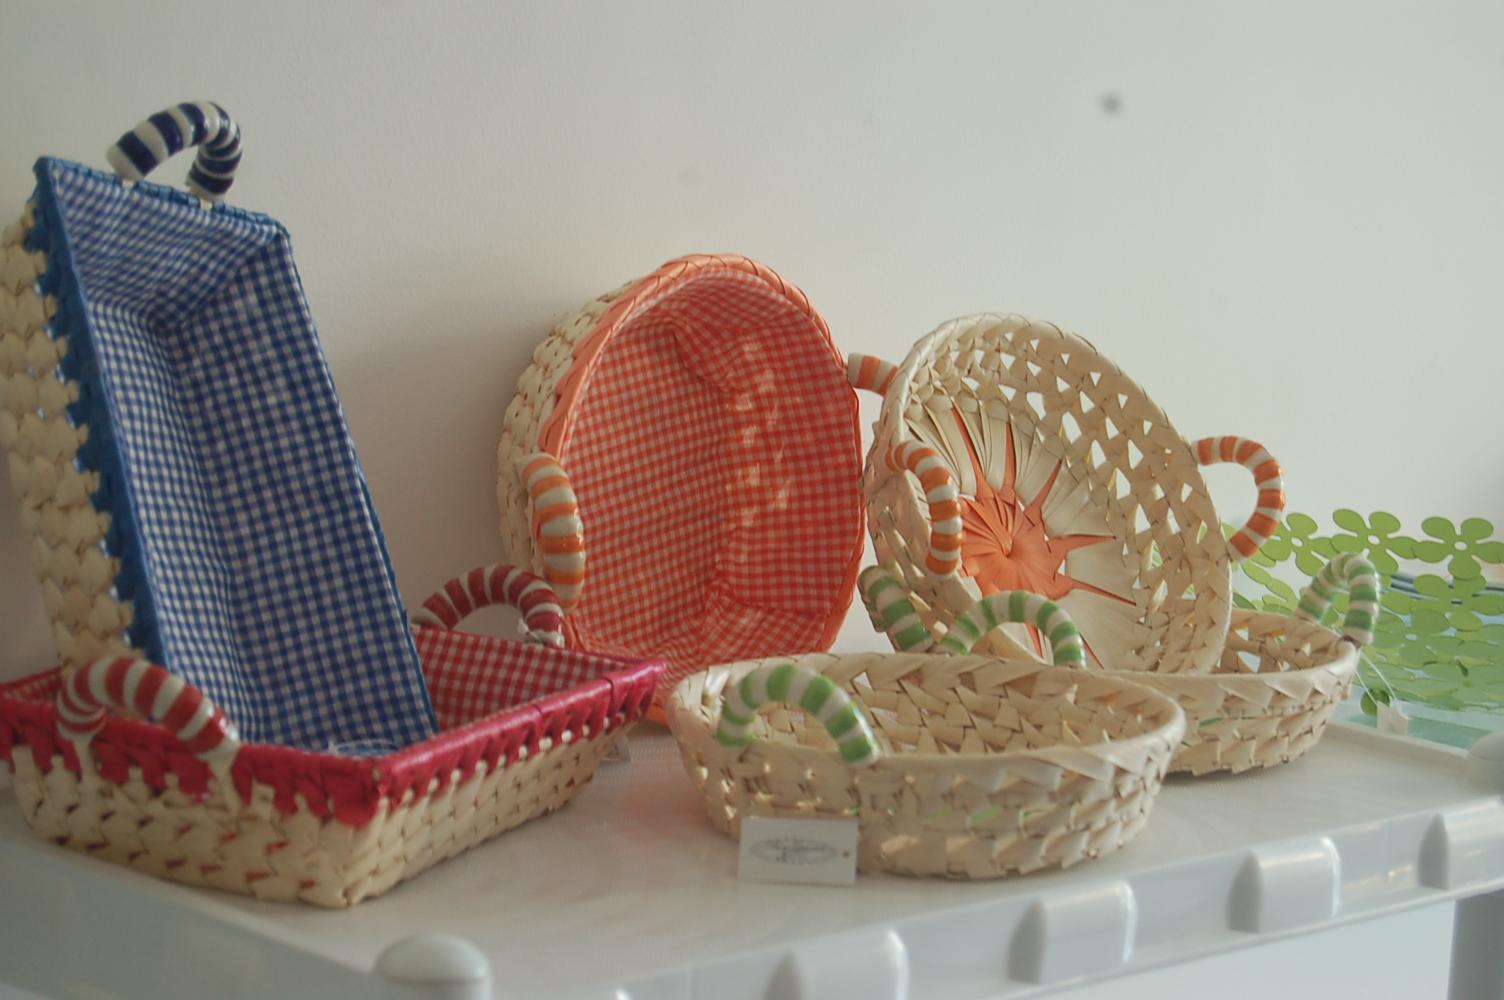 S miudezas virtual cestas decorativas - Cestas decorativas ...